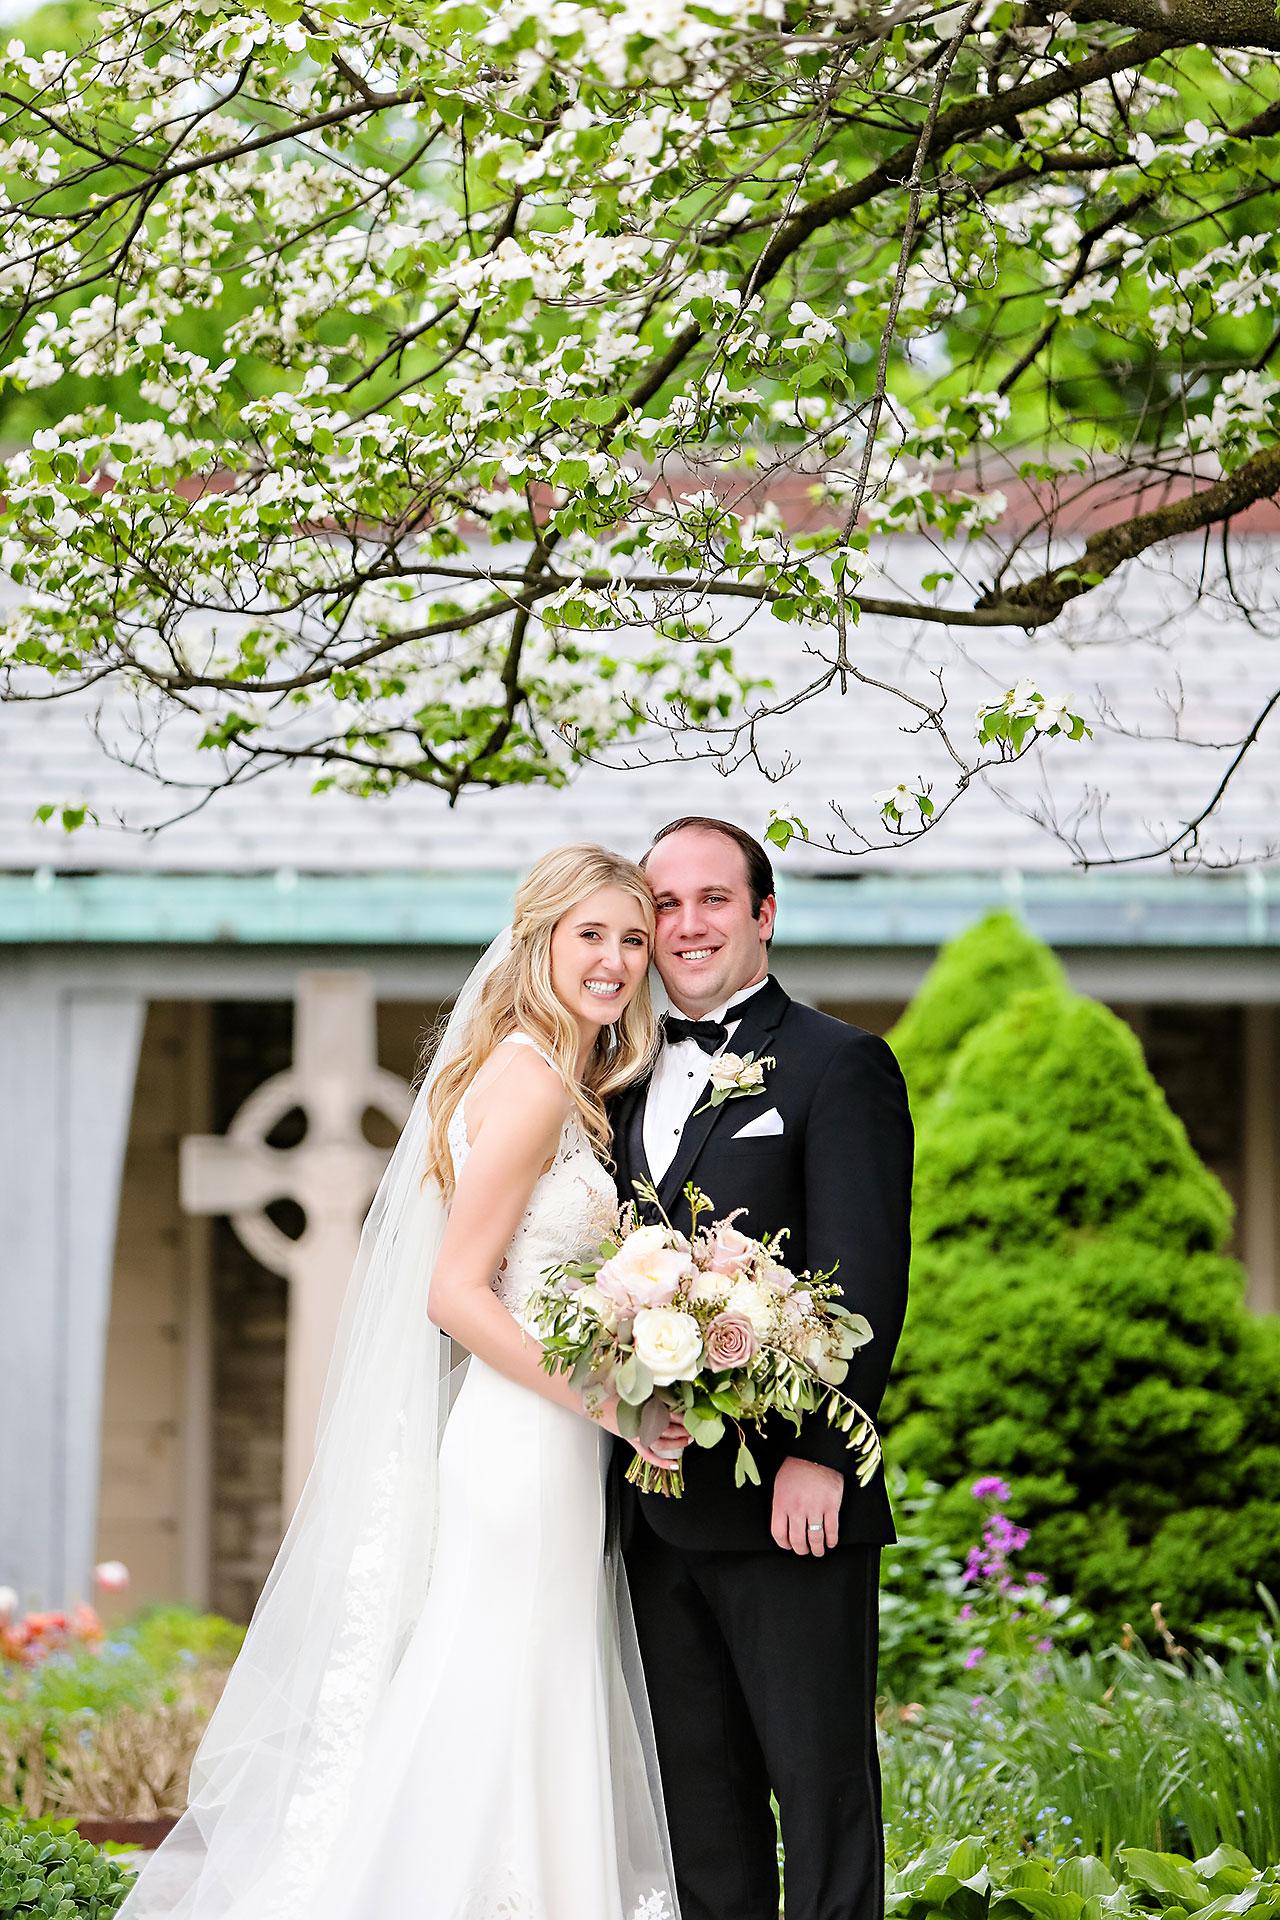 Allison Jeff Union Station Crowne Plaza Indianapolis wedding 251